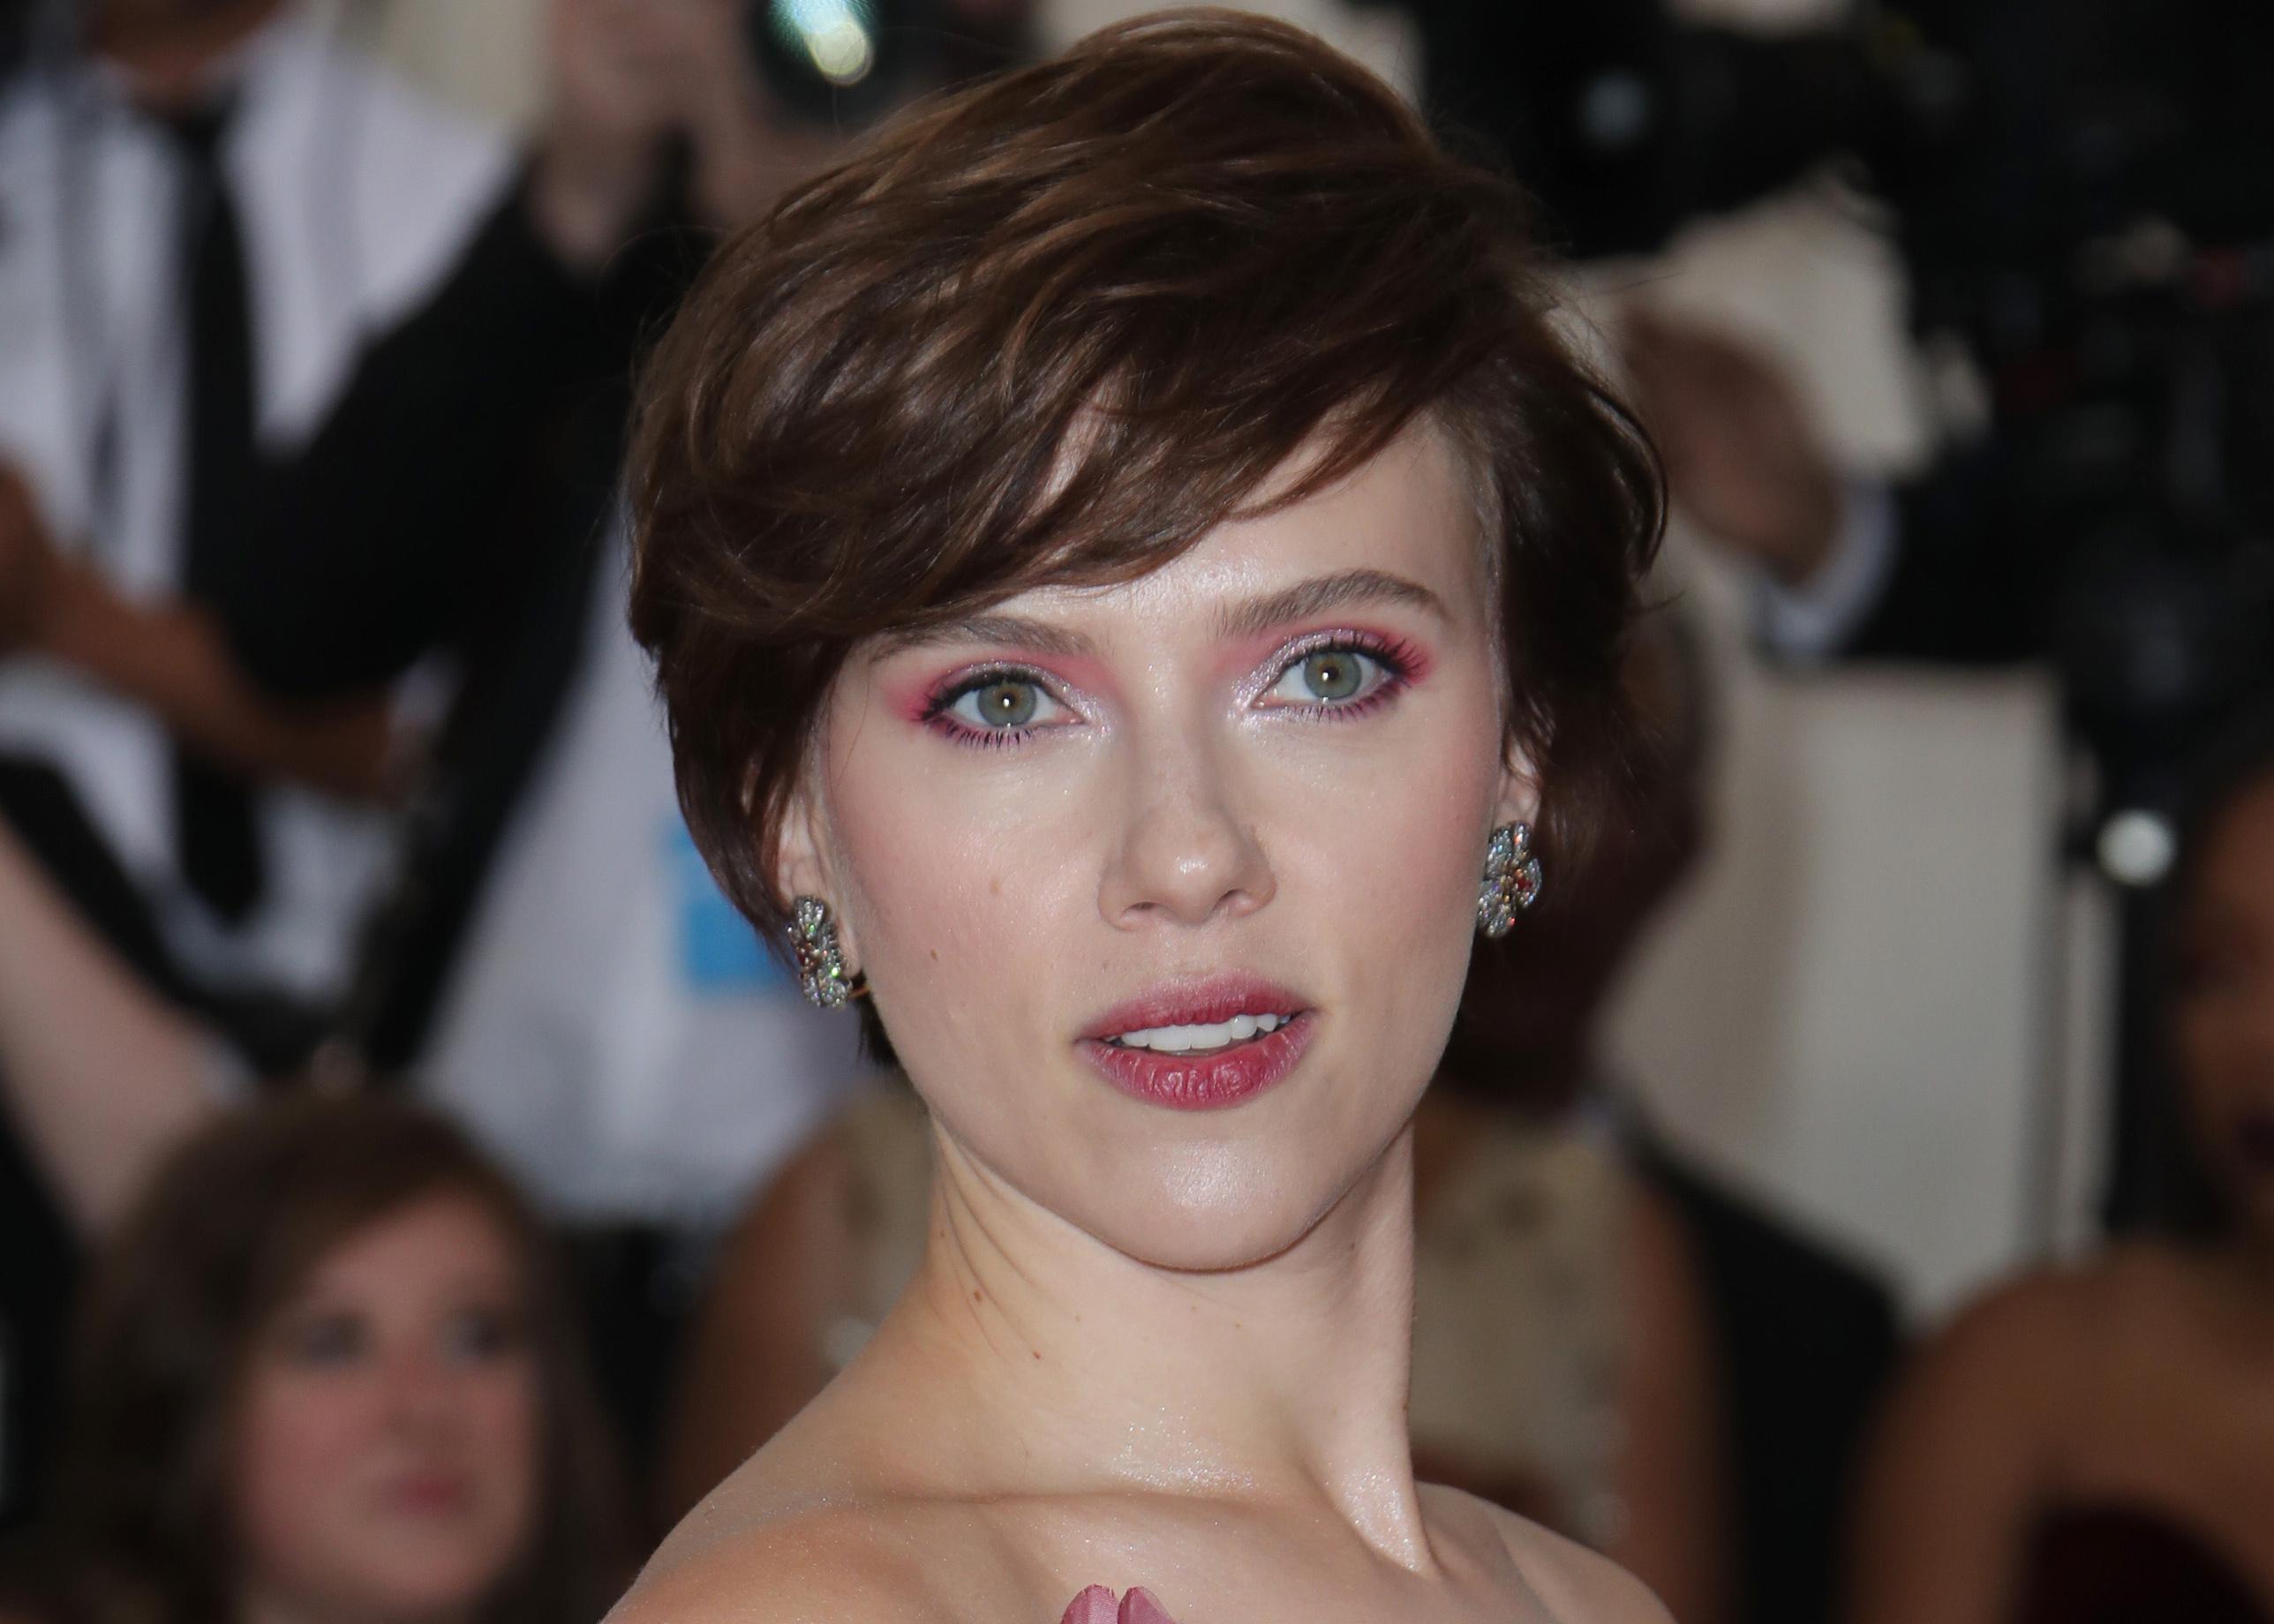 Scarlett Johansson Responds To Backlash For Being Cast As Trans Man Deadline